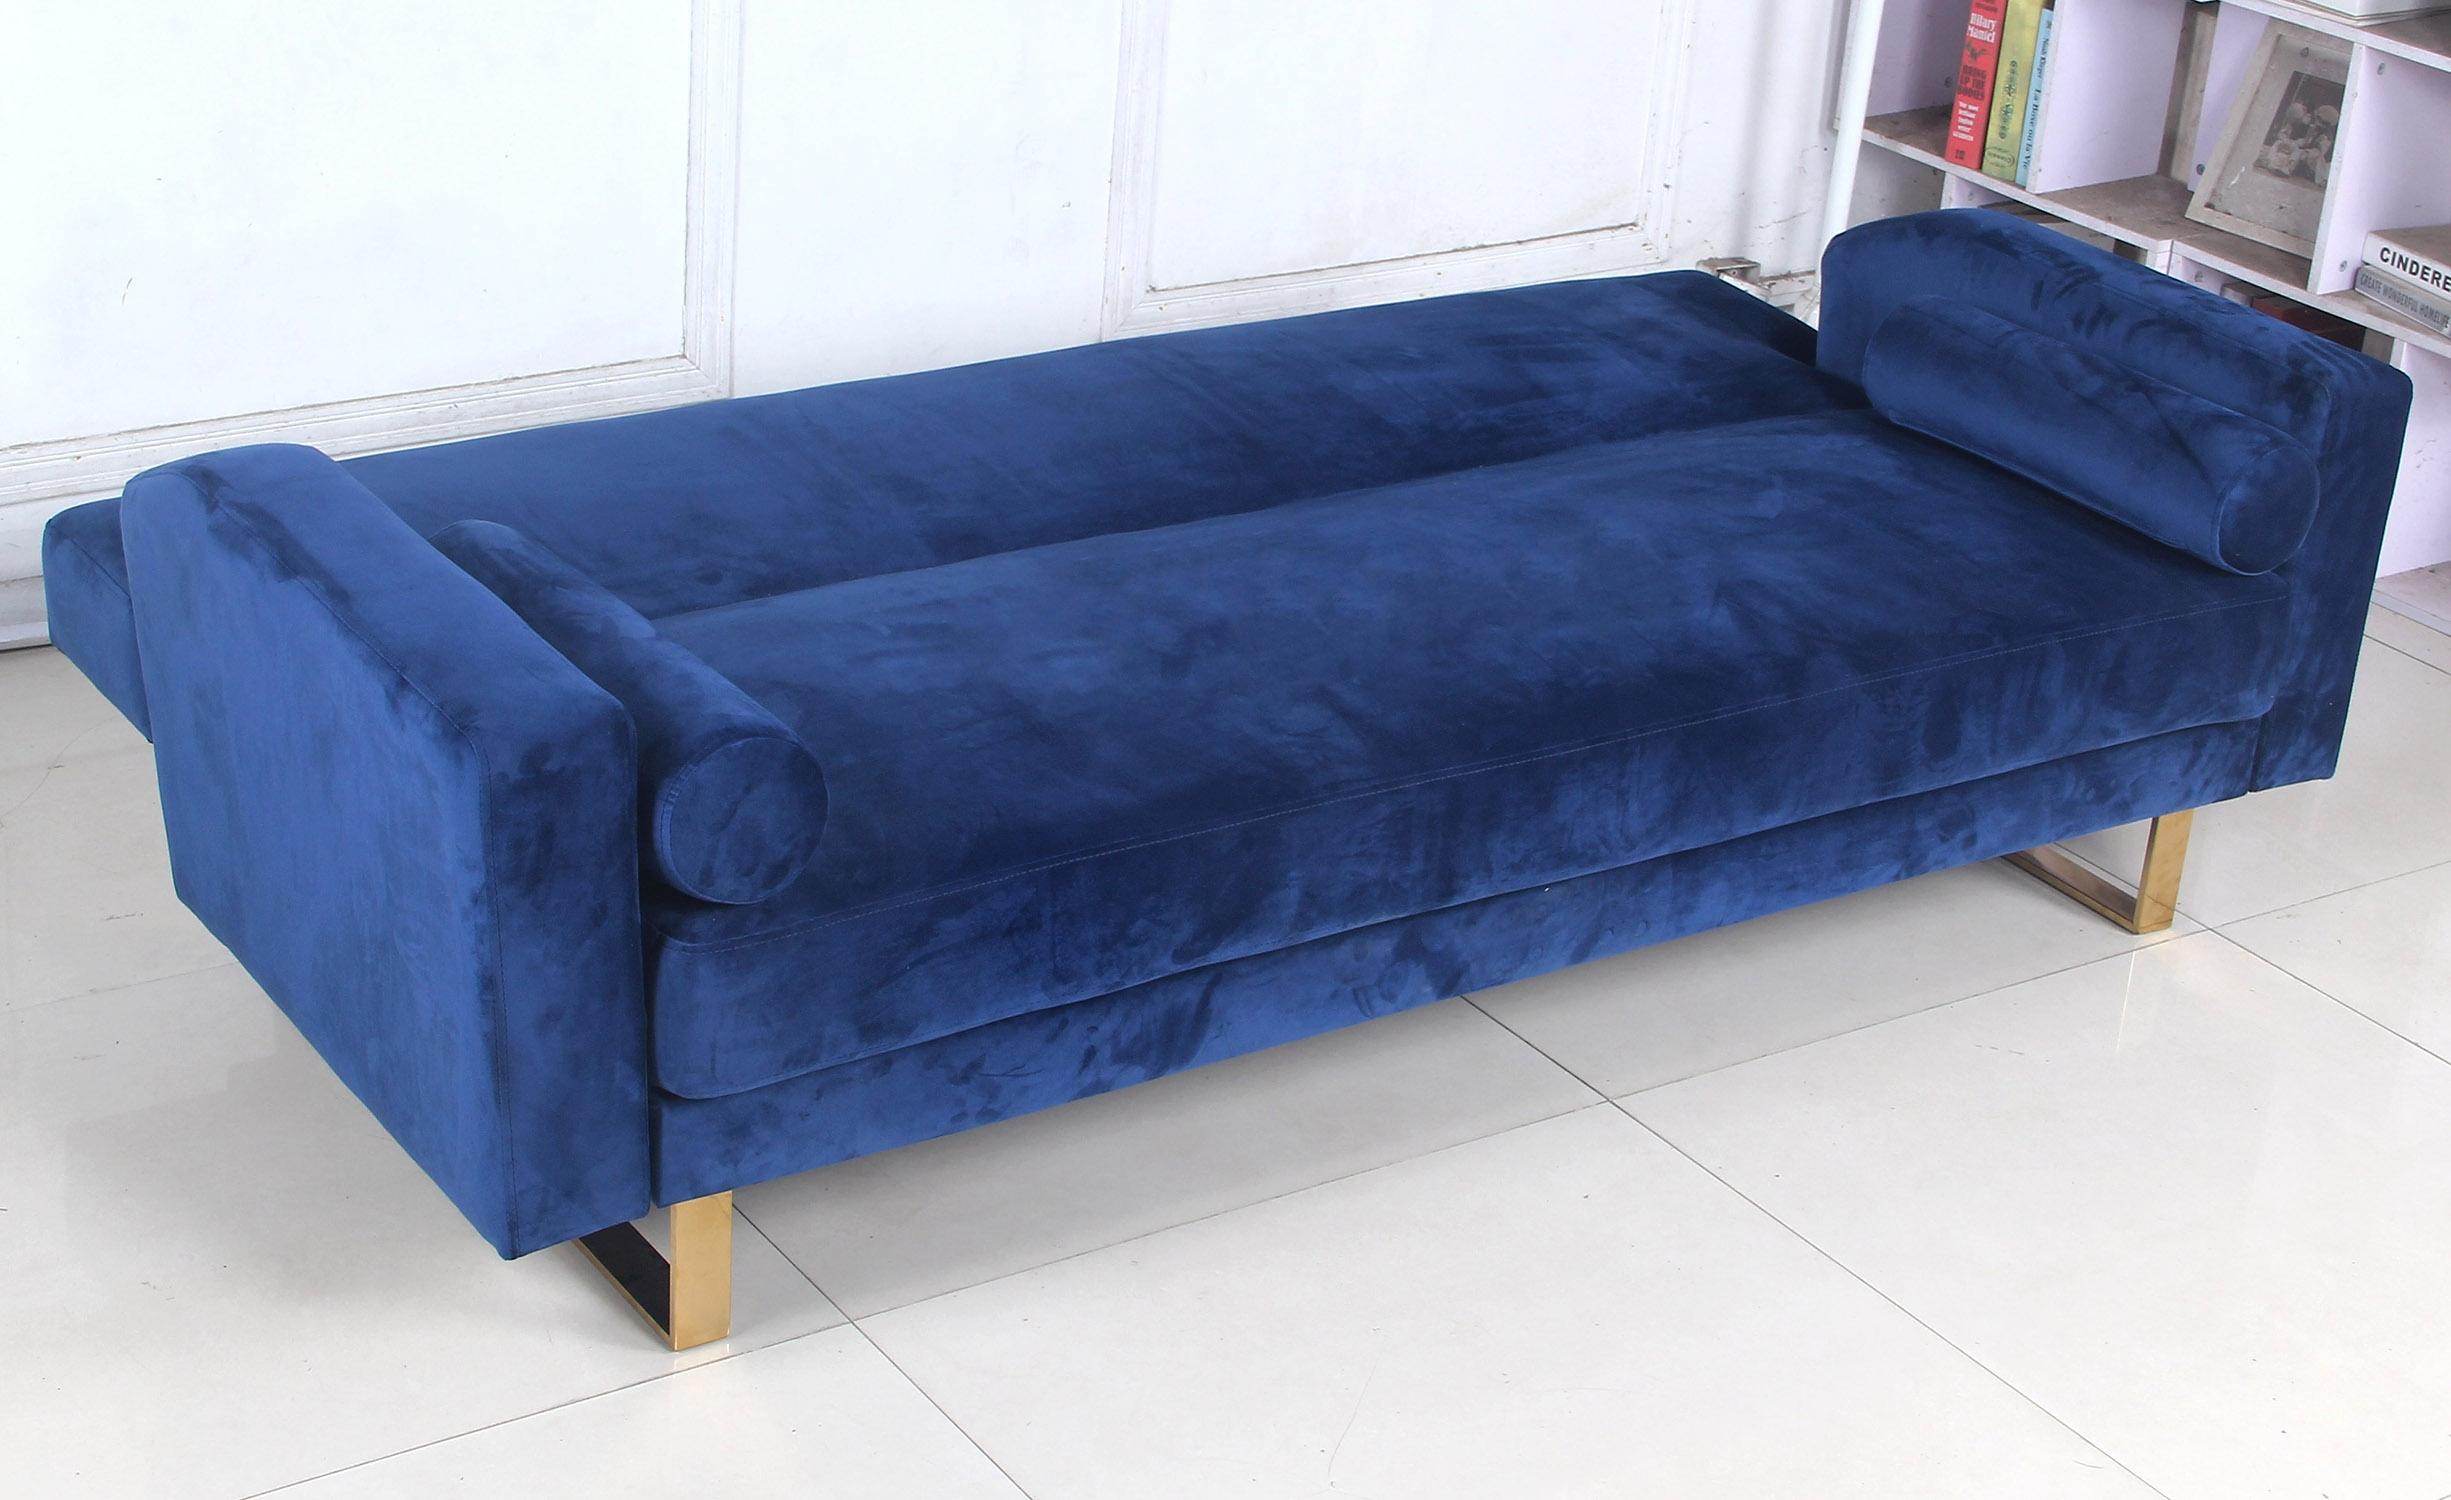 Divano convertibile Djobi in velluto blu e gambe dorate